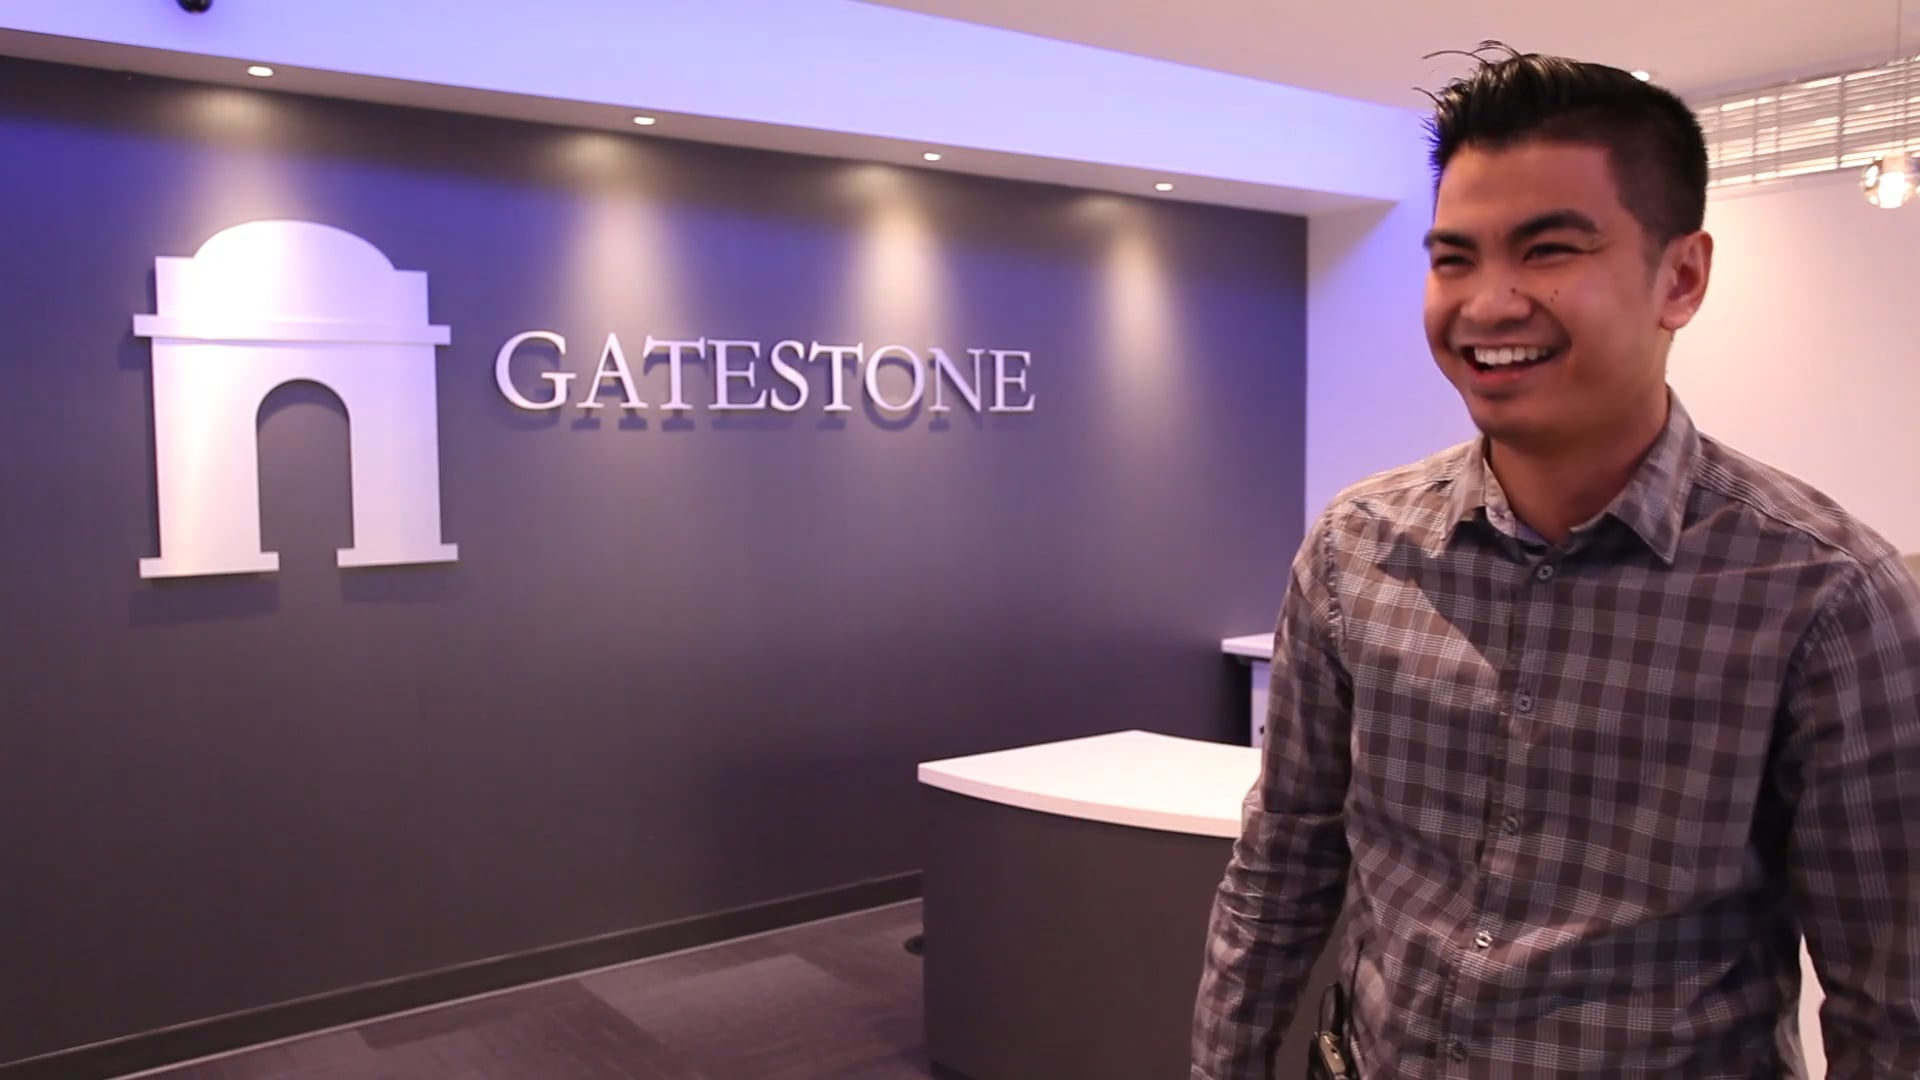 Gatestone